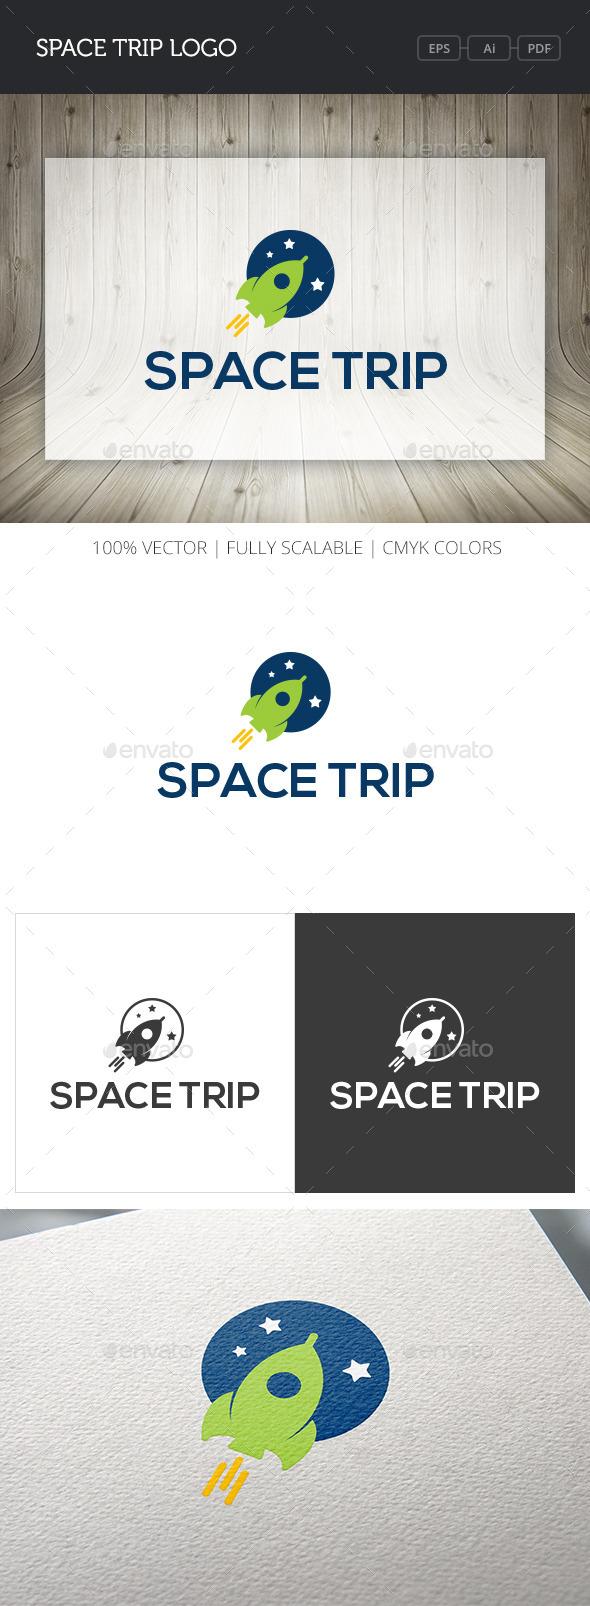 GraphicRiver Space Trip Logo 10767390